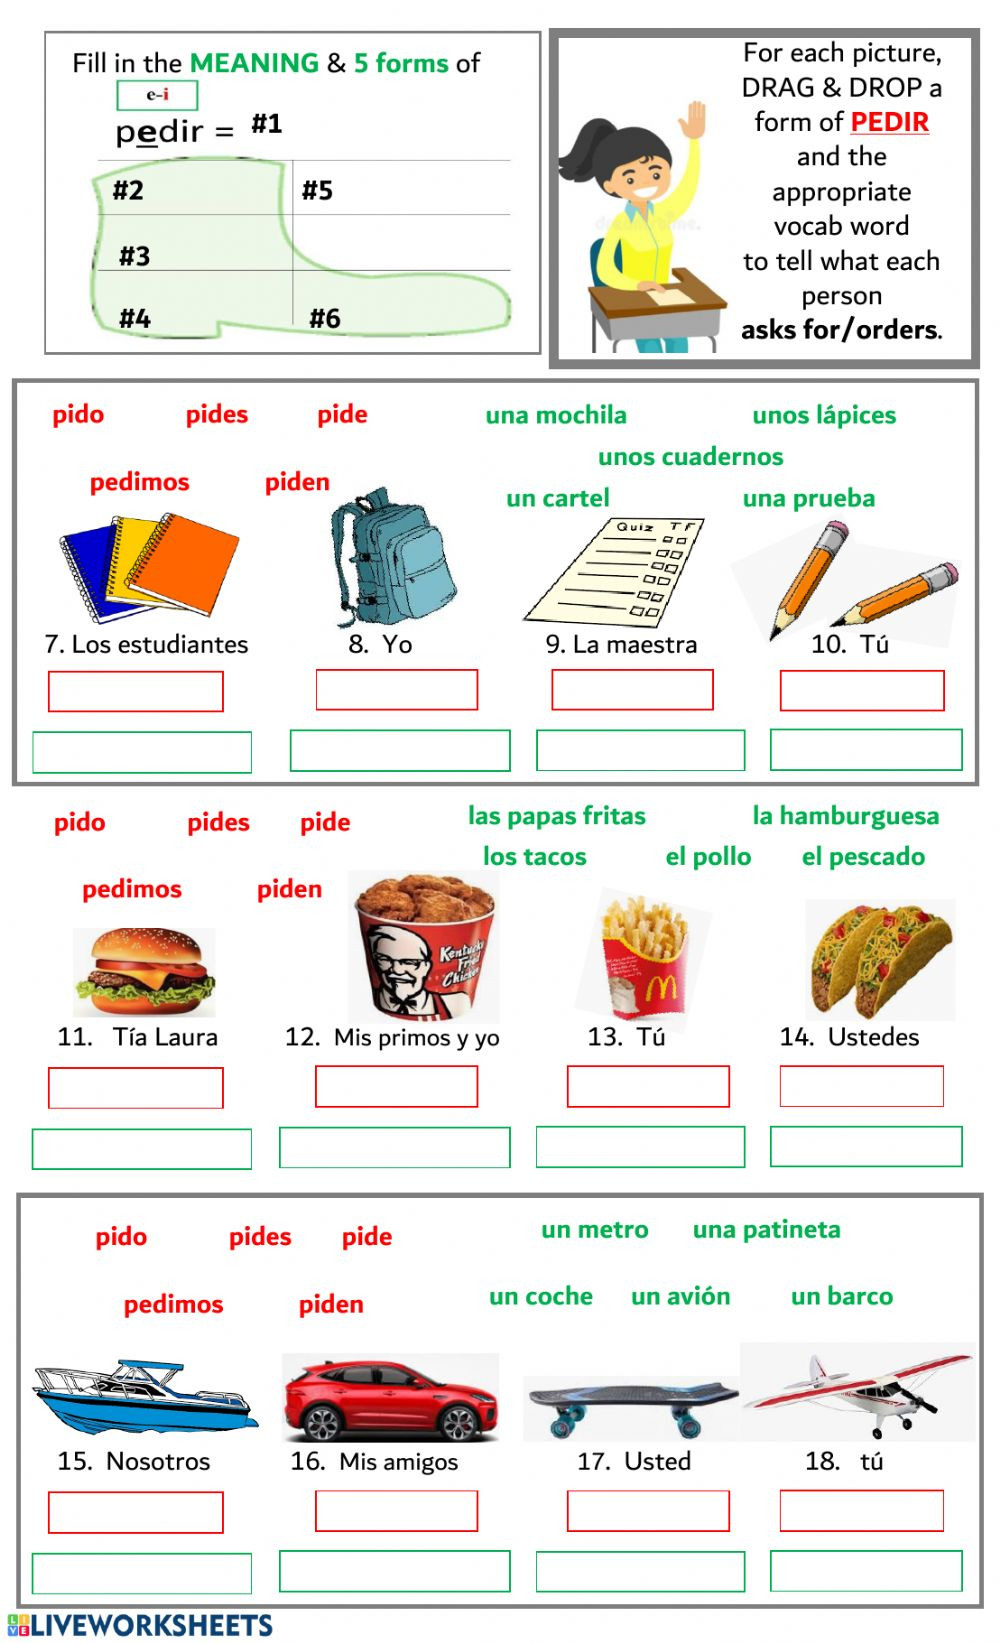 Stem Changing Verbs Worksheet Answers E I Stem Changing Verbs Pedir Interactive Worksheet